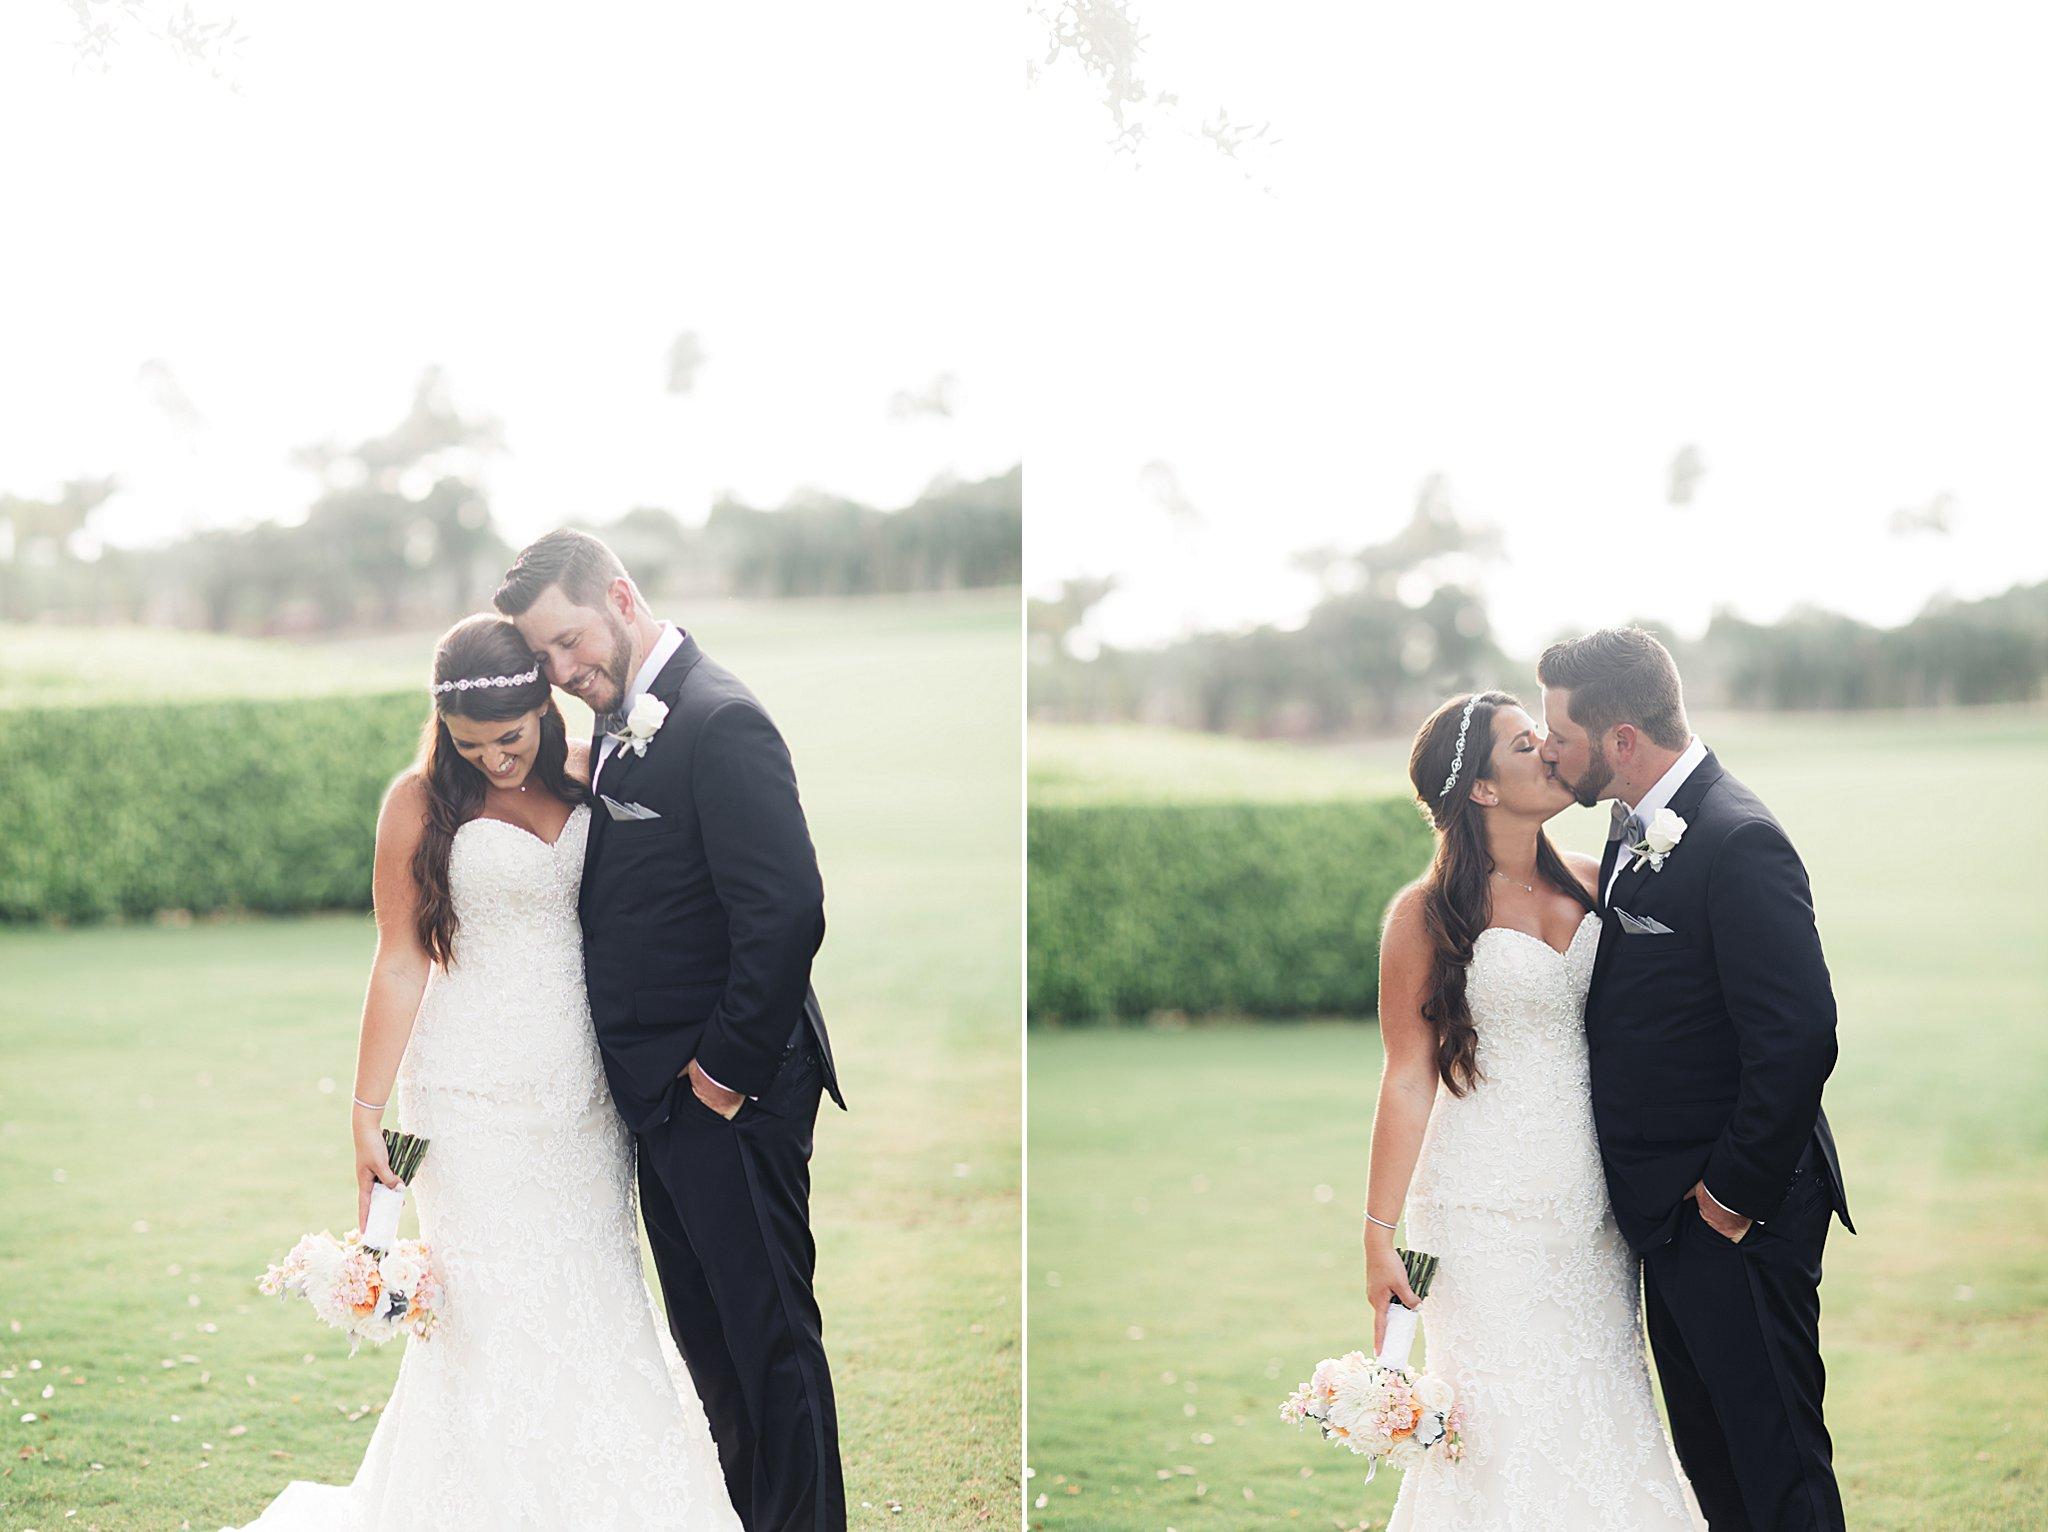 WeddingandEngagementFloridaPhotographer_2817.jpg